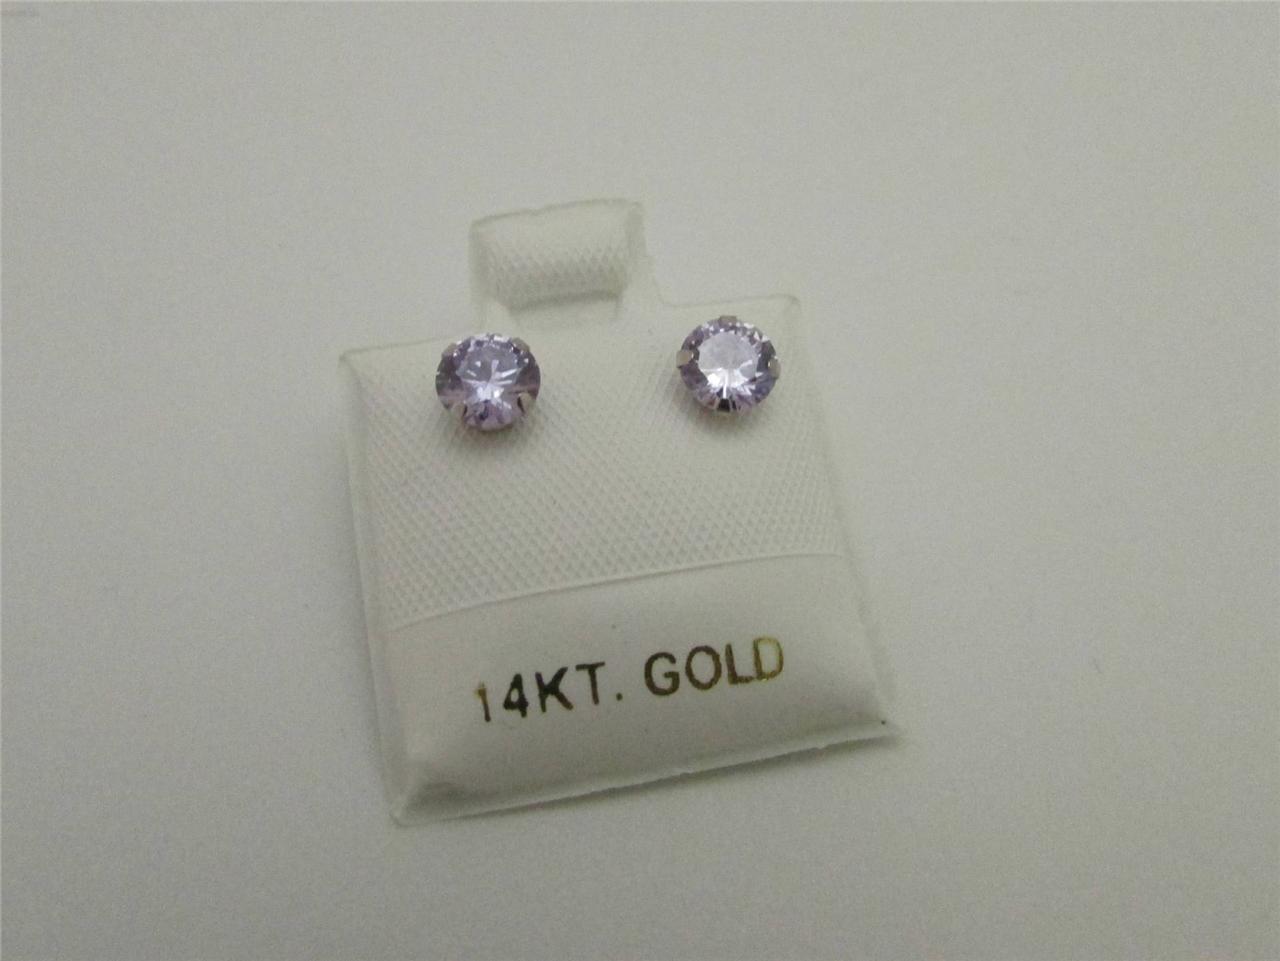 Birthstone Earrings 14kt White Gold Round Shape Stud